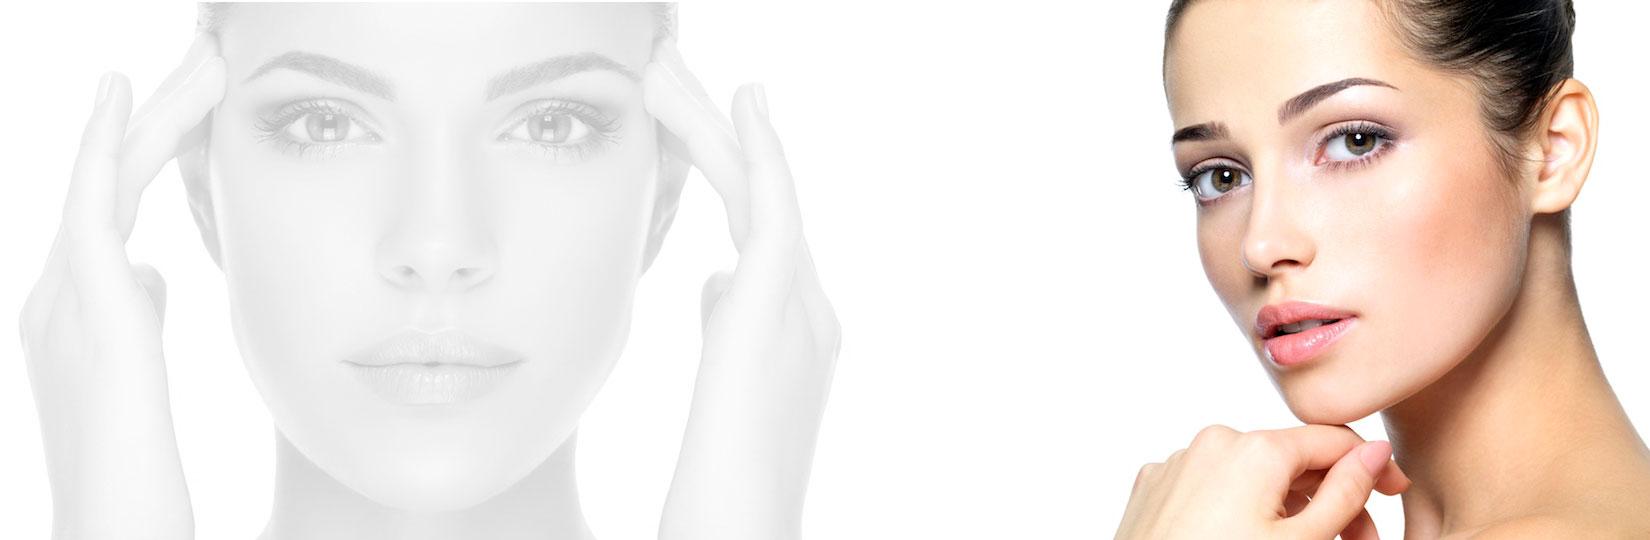 groh clinic botox fillers huid haar peelings